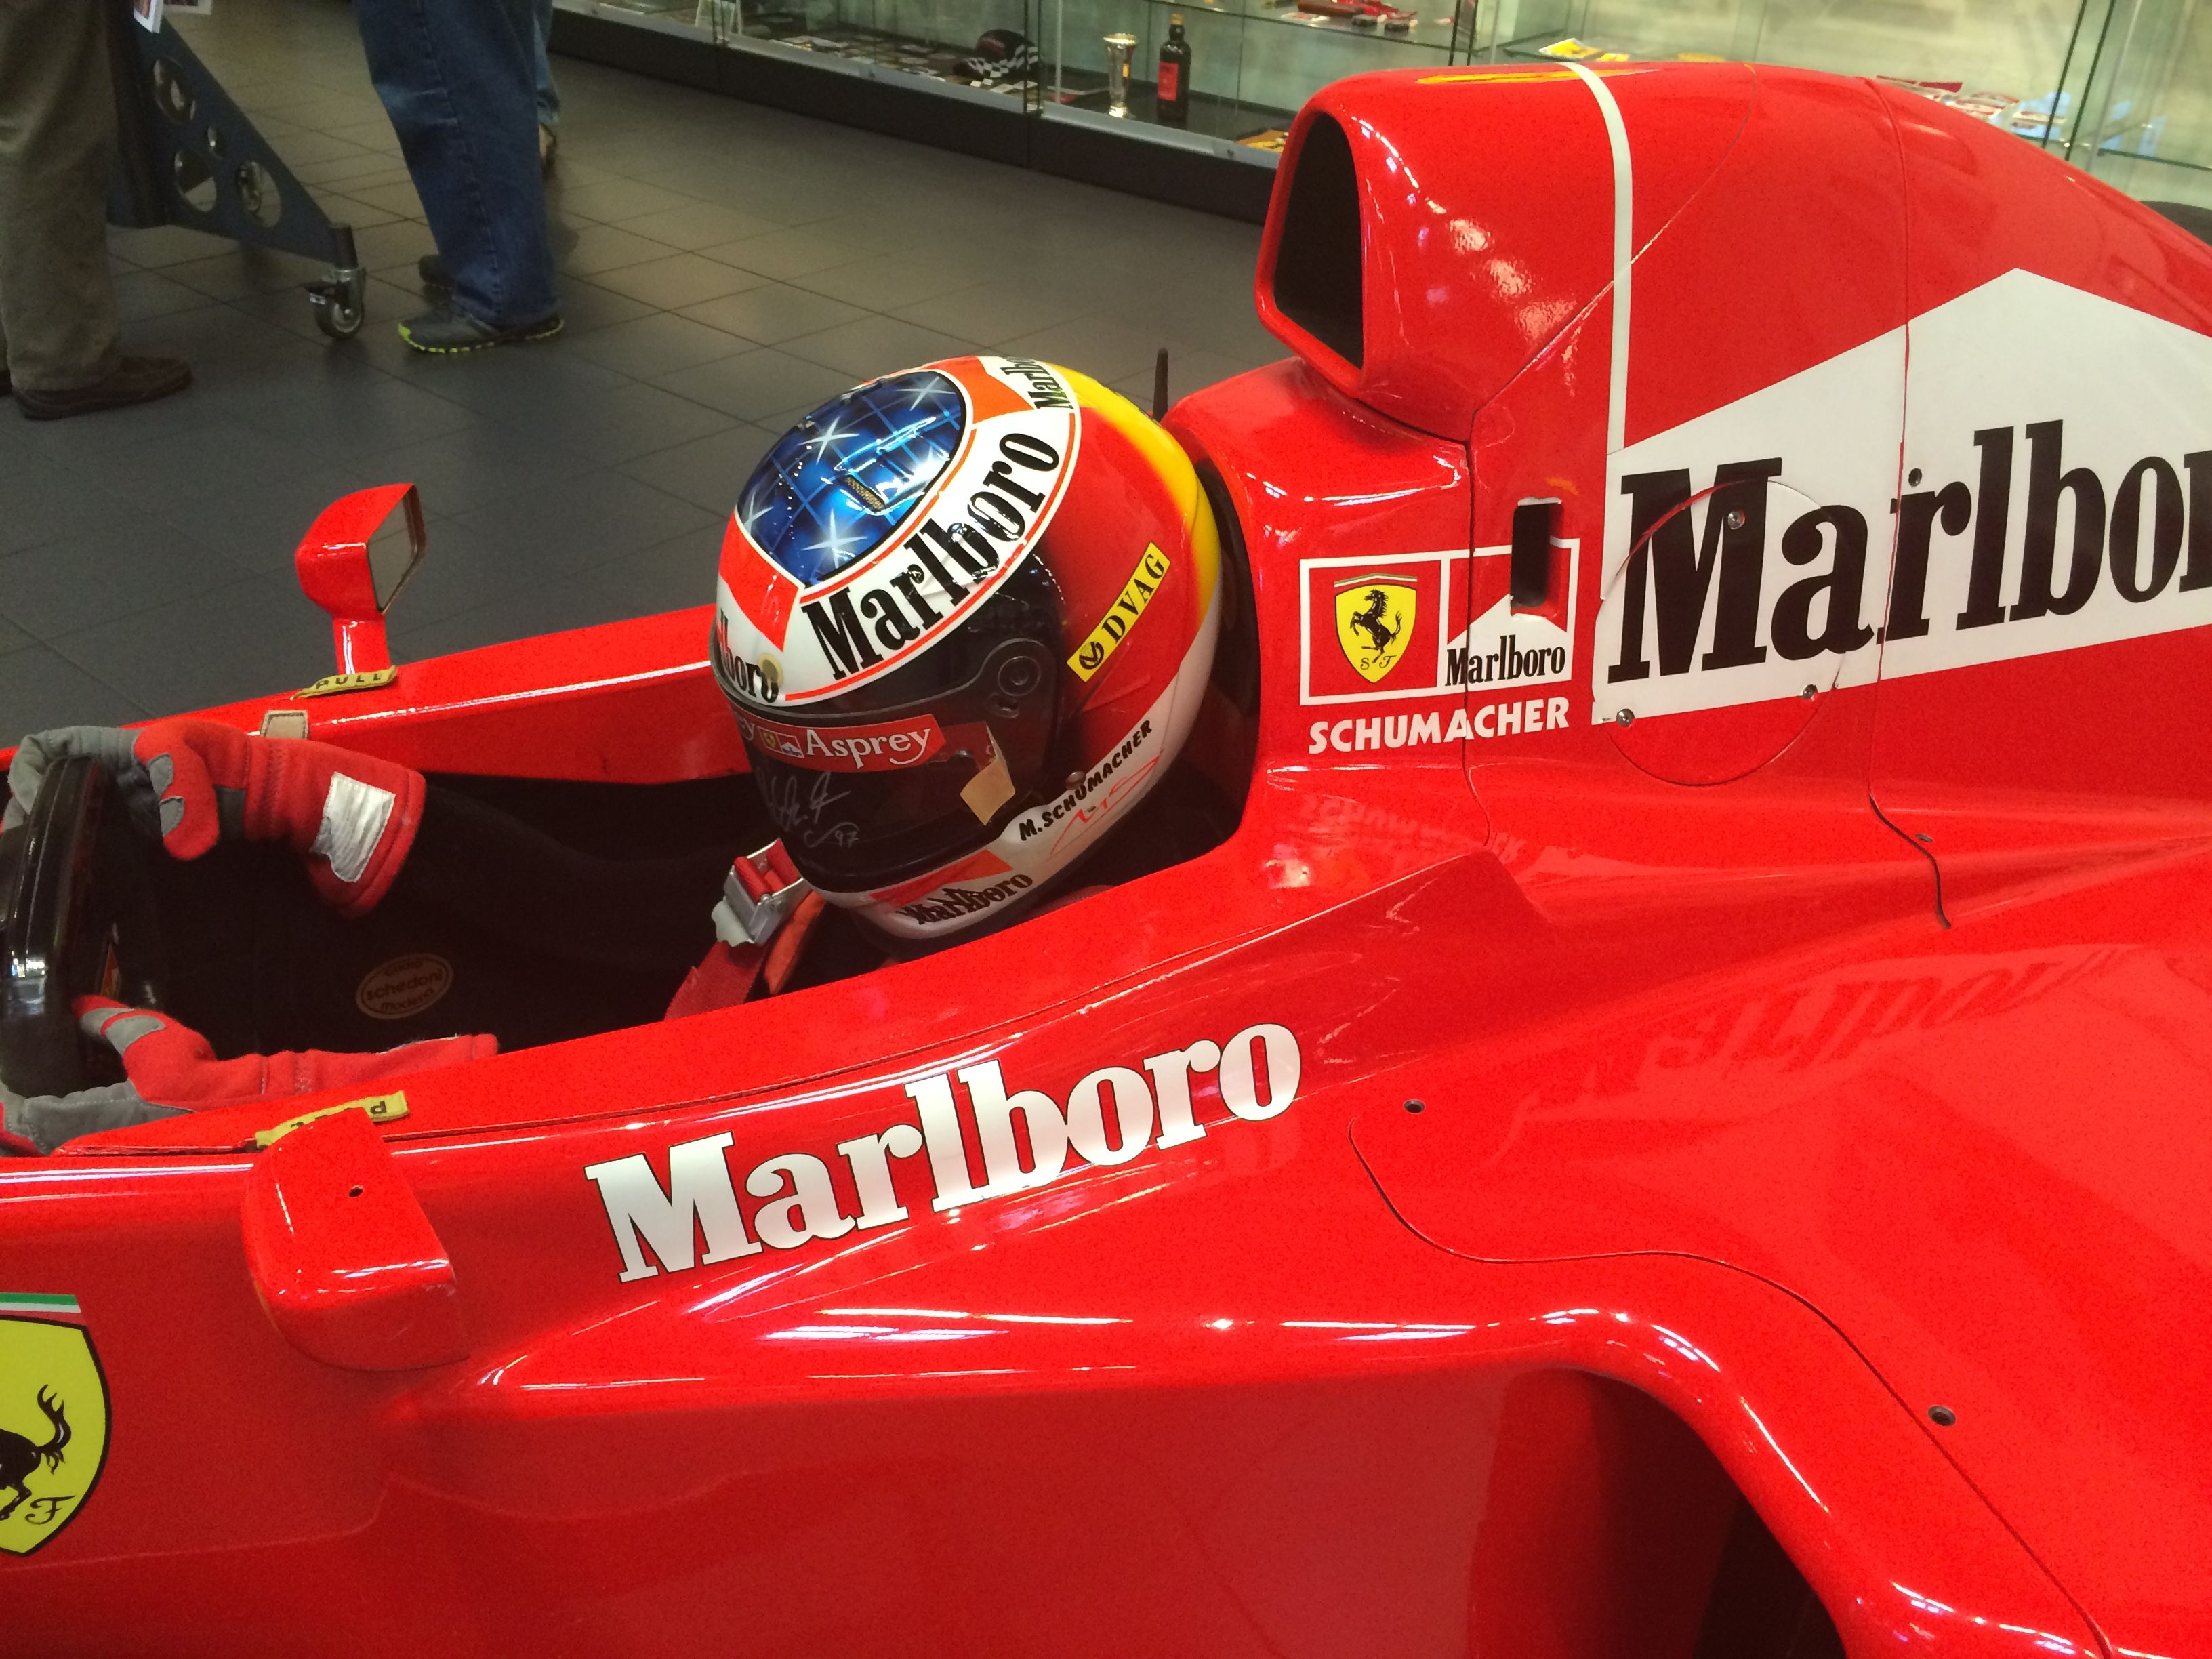 Michael Schumacher 1997 Ferrari F310B Helmet Imgur